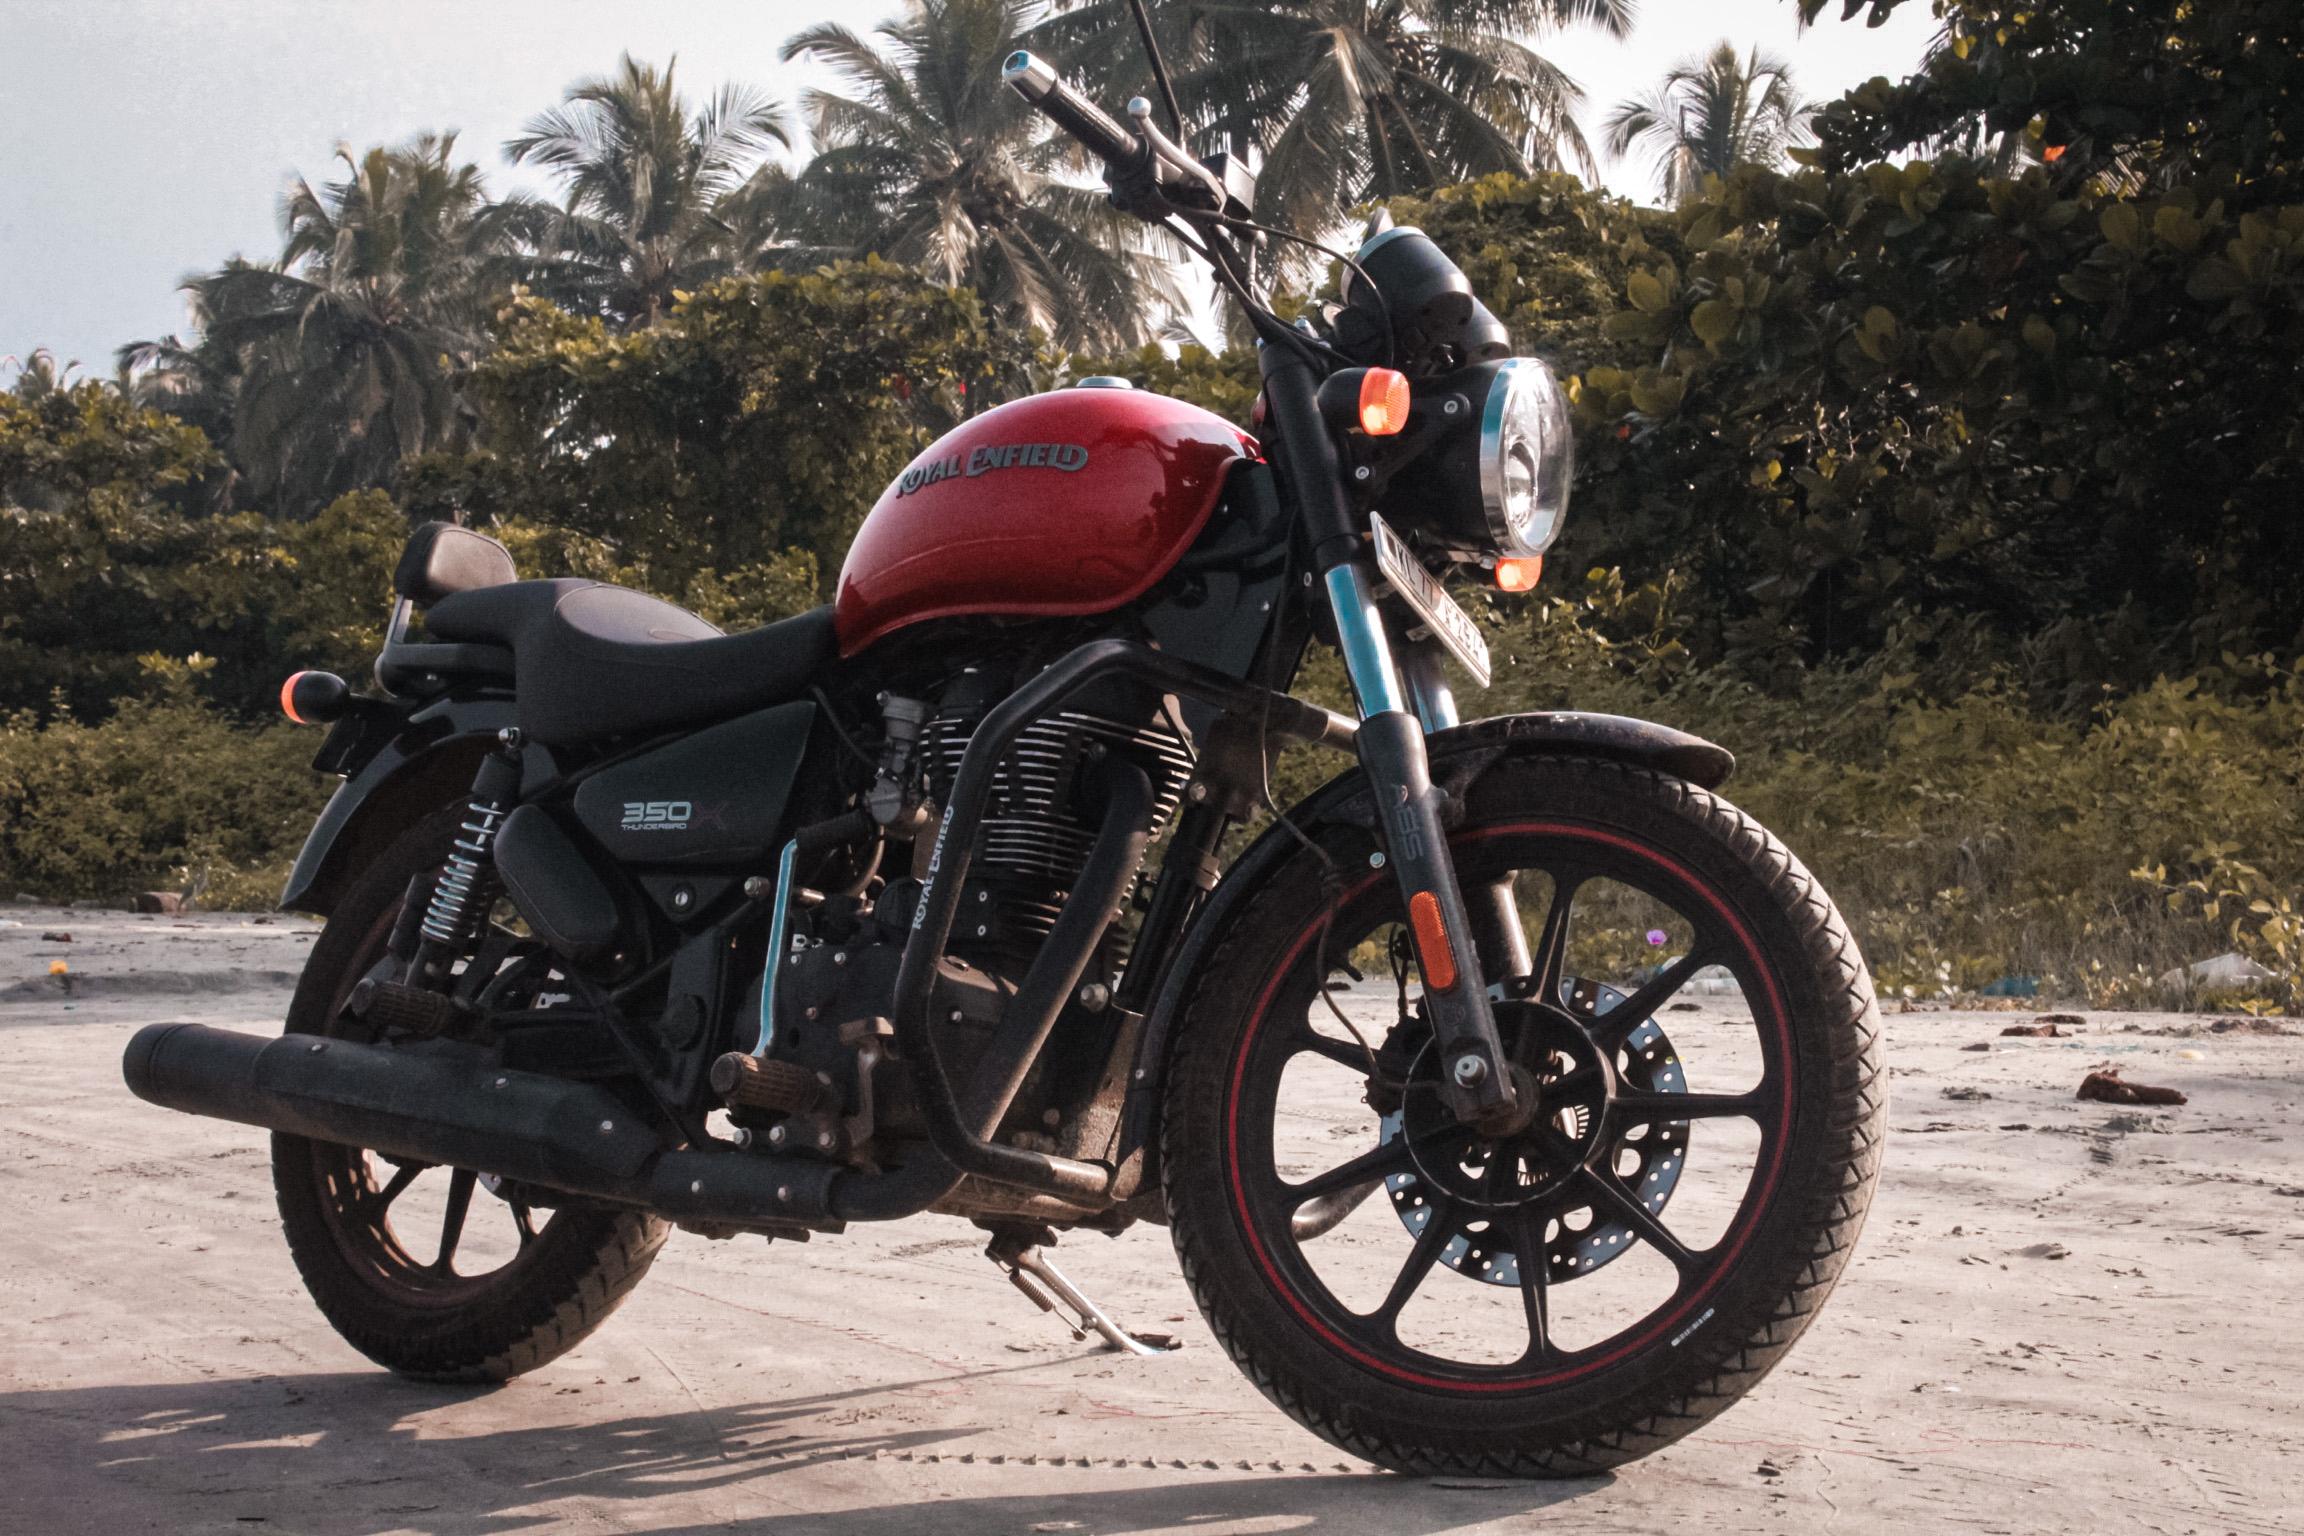 motorbike on road